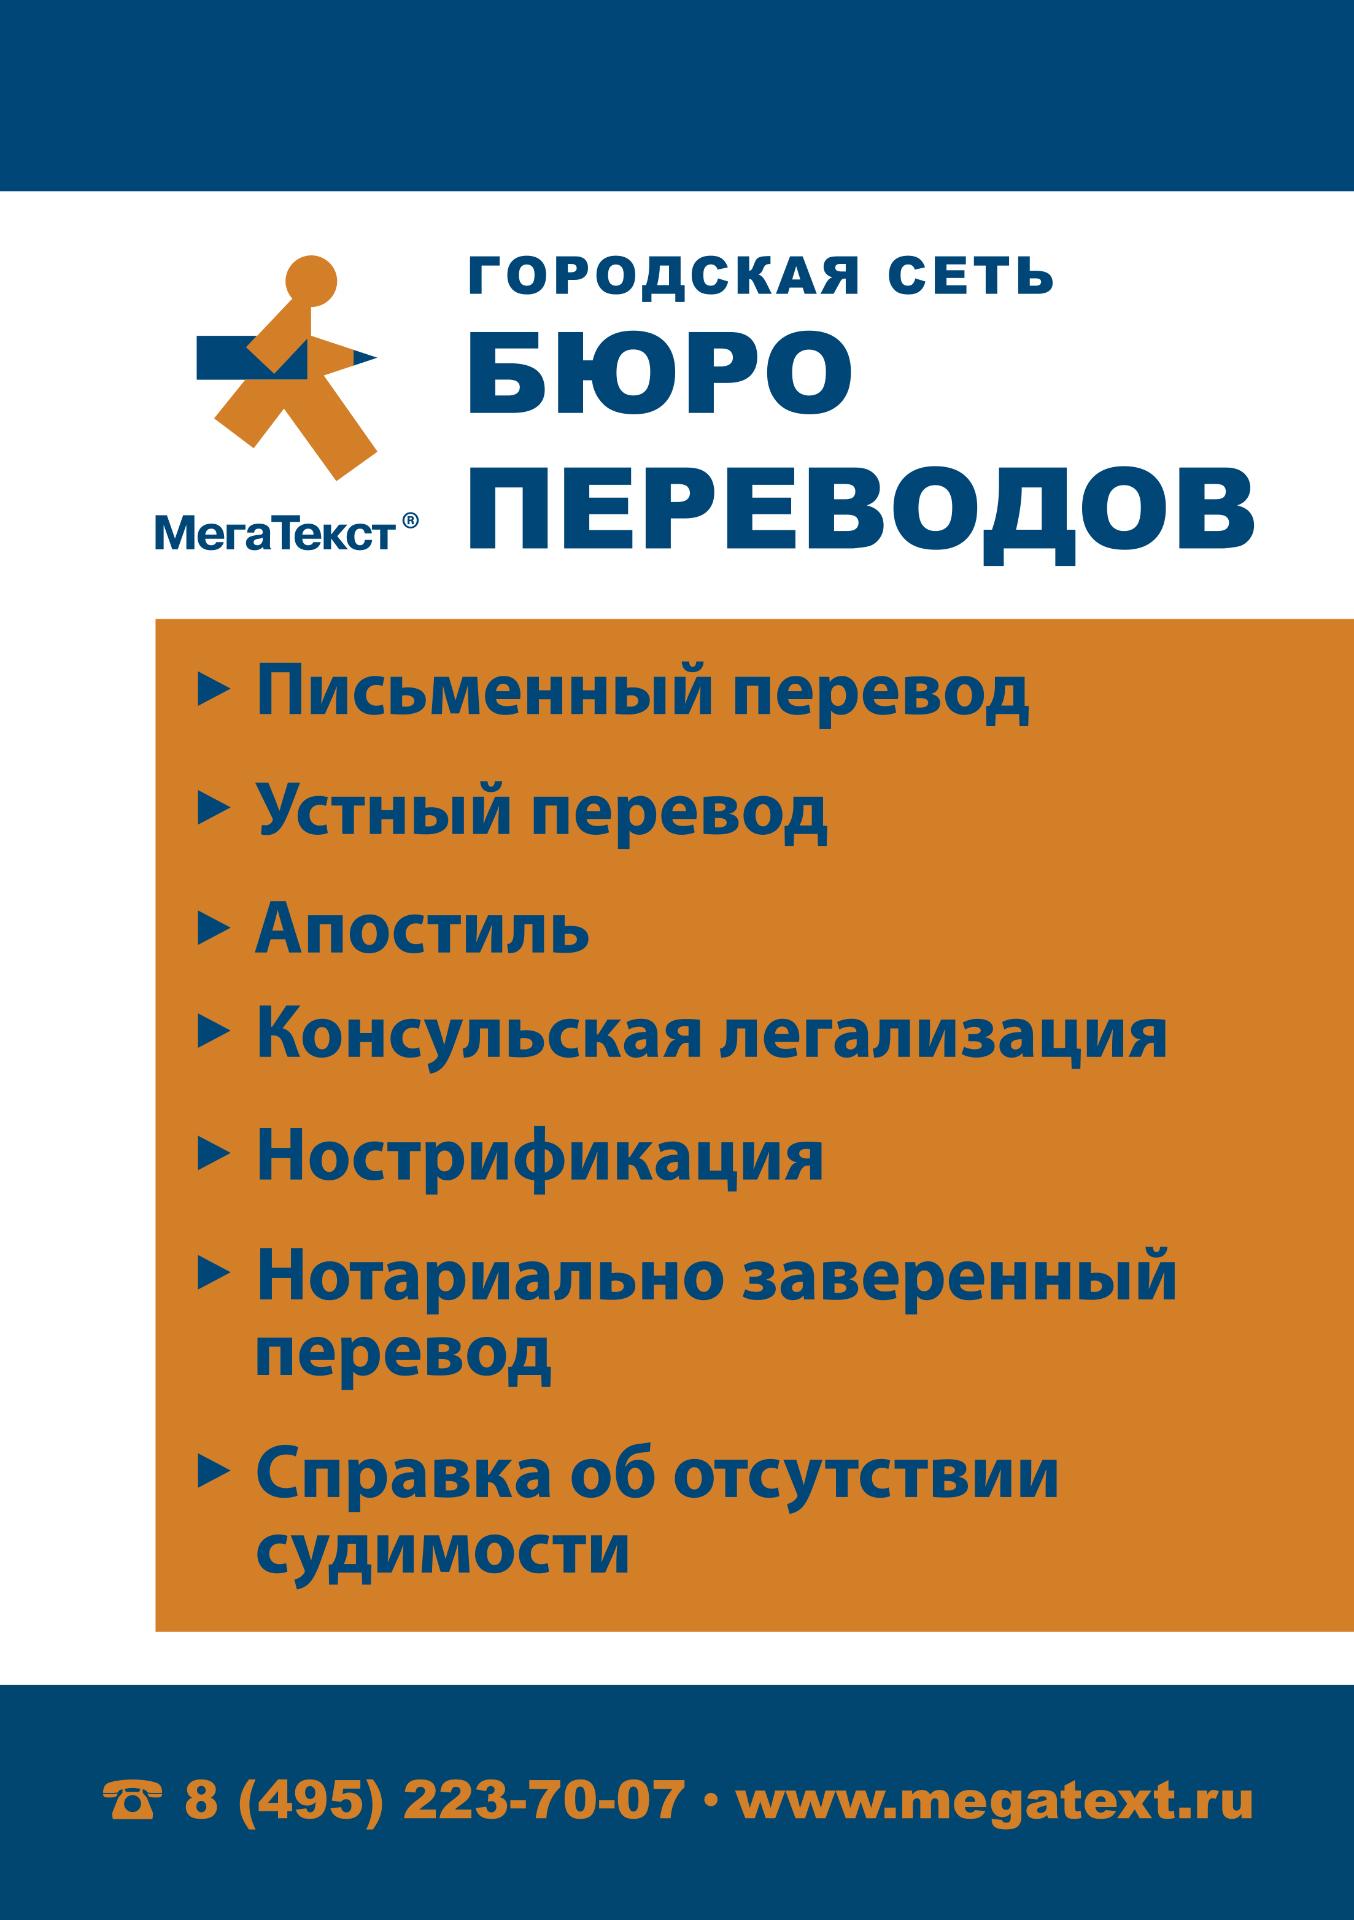 Megatext.ru